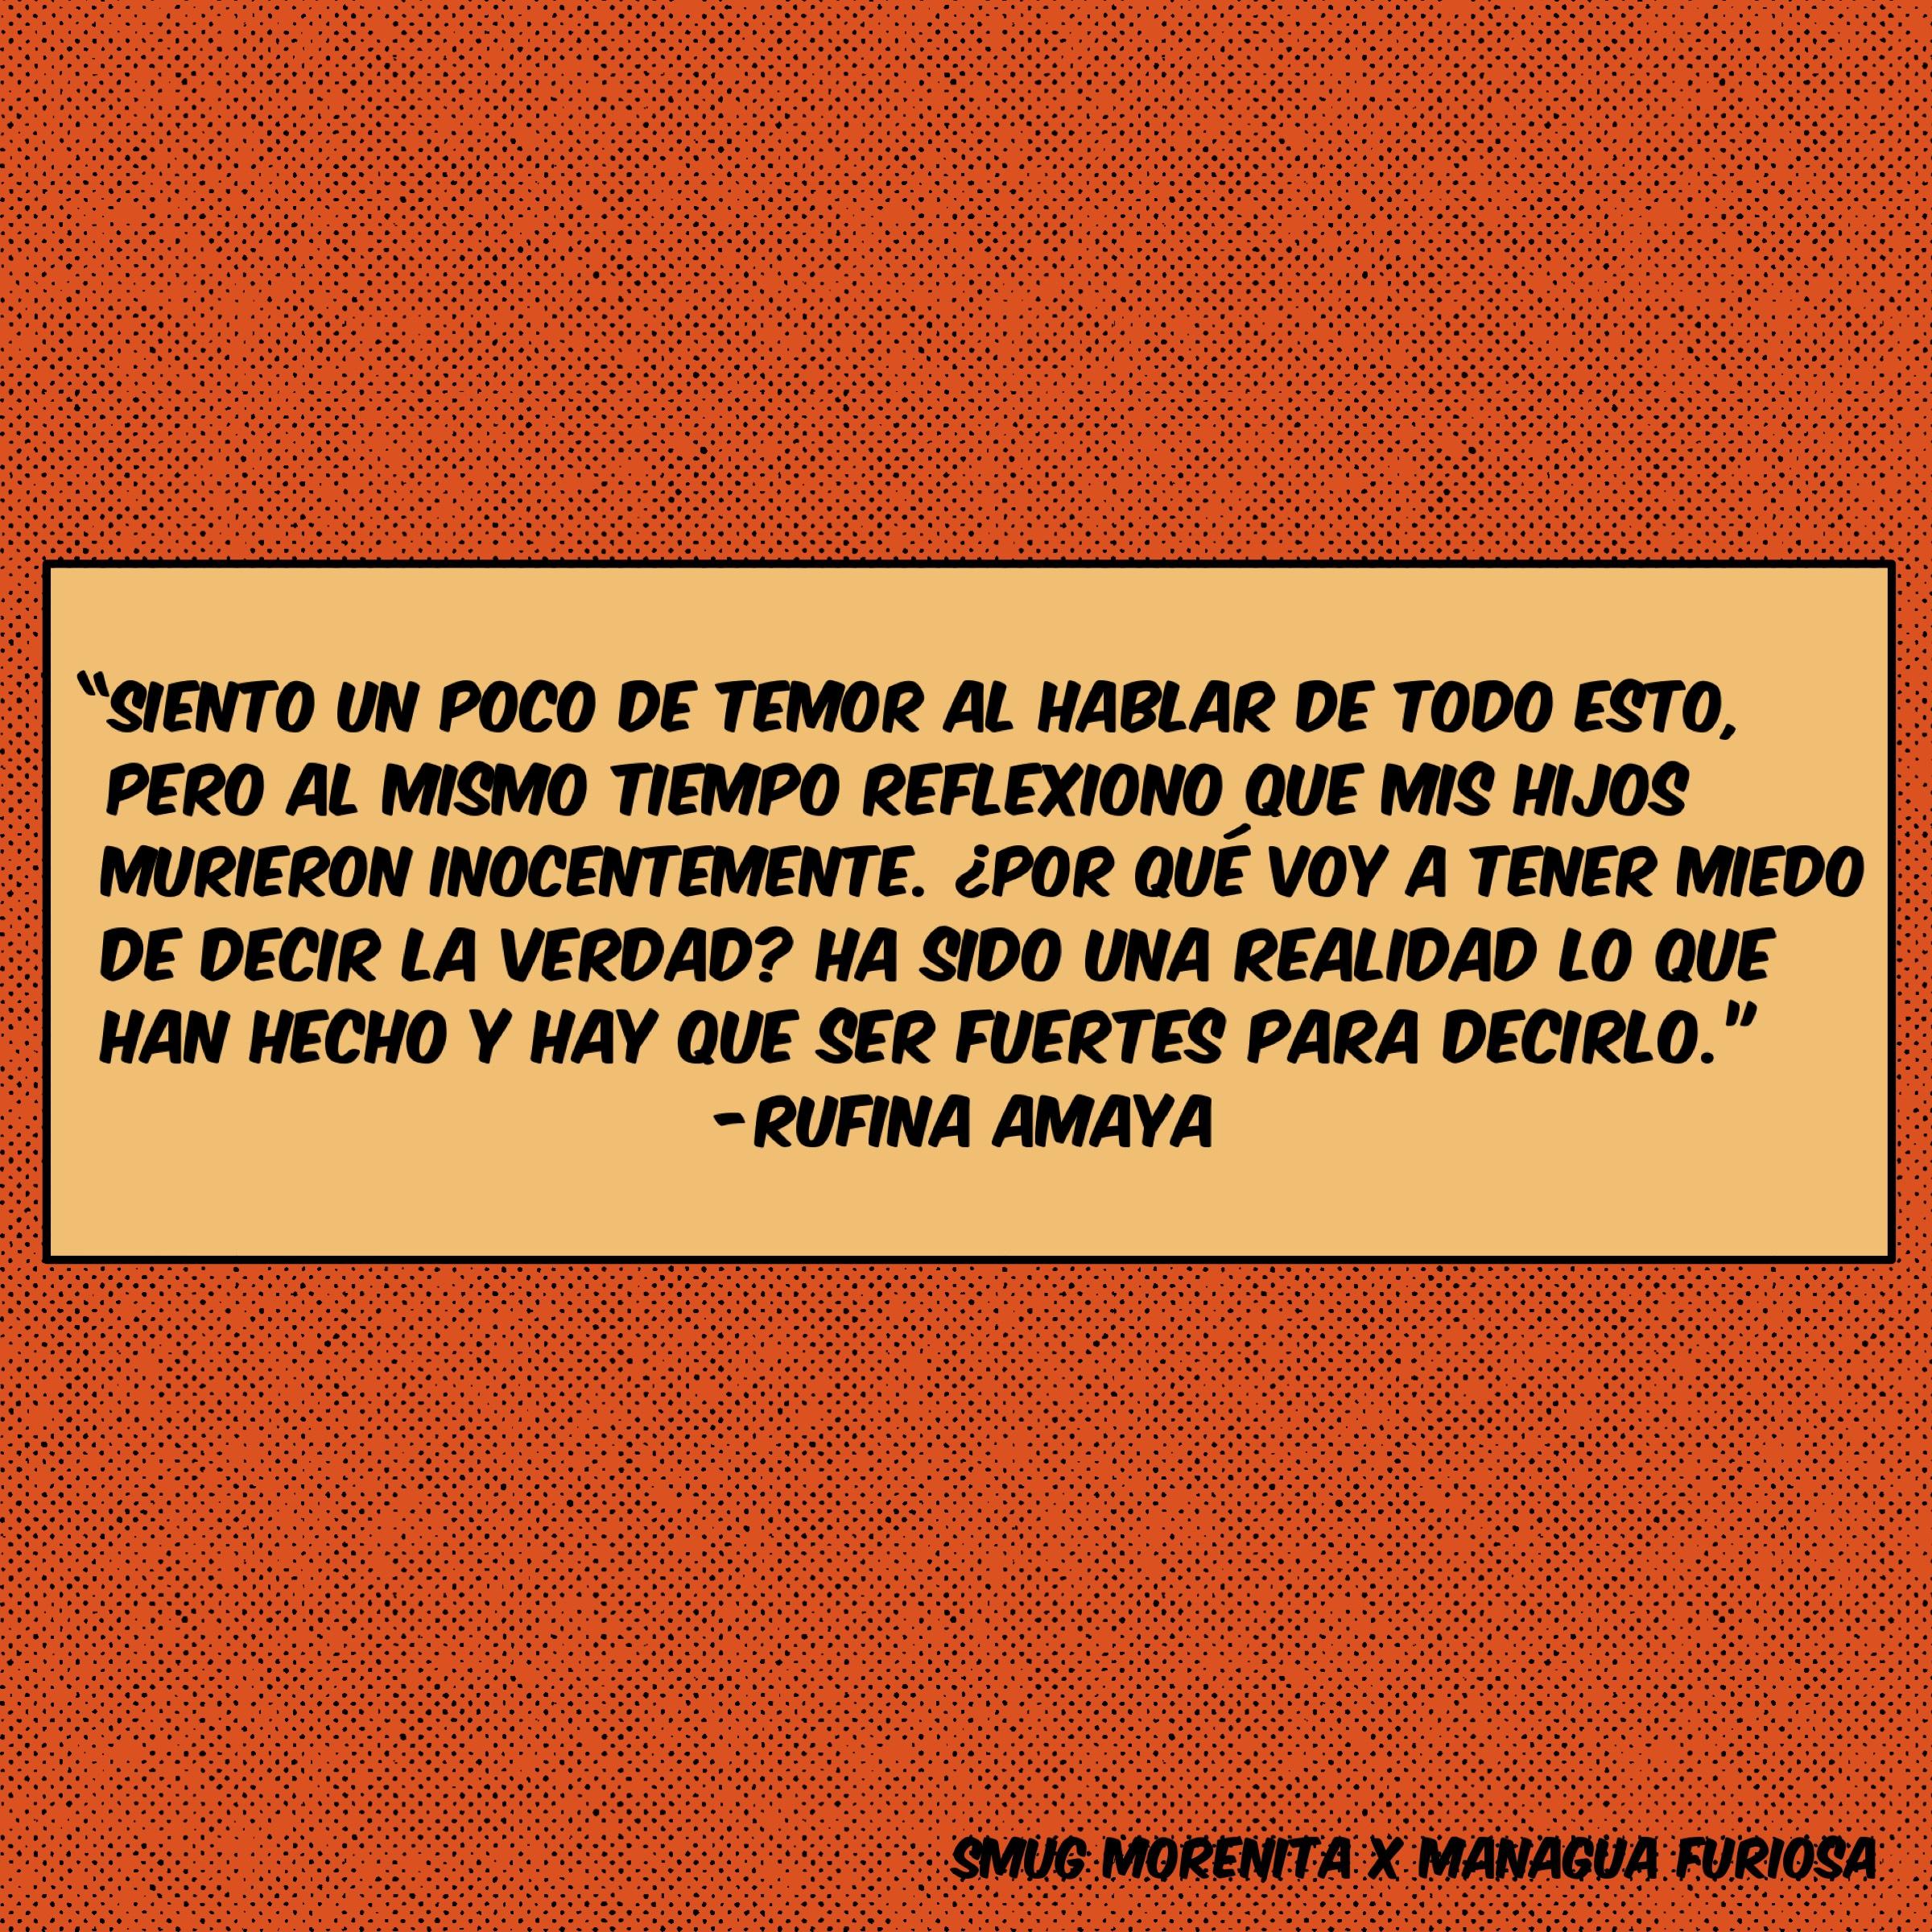 Rufina Amaya Quote - Web Image .jpg